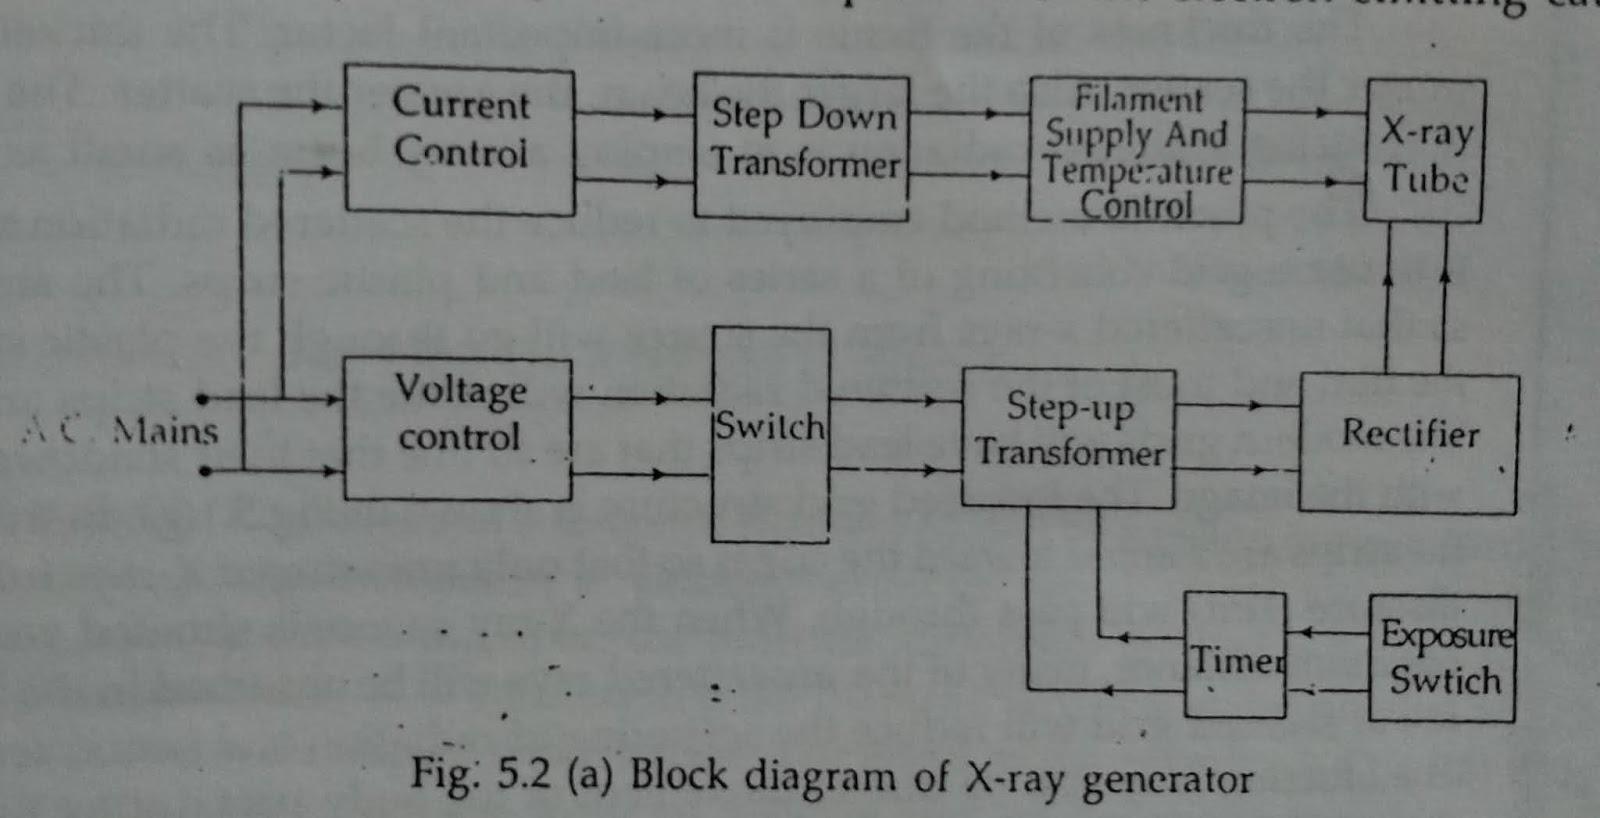 X-ray machine - Electronicinfo | X Ray Generator Block Diagram |  | Electronicinfo